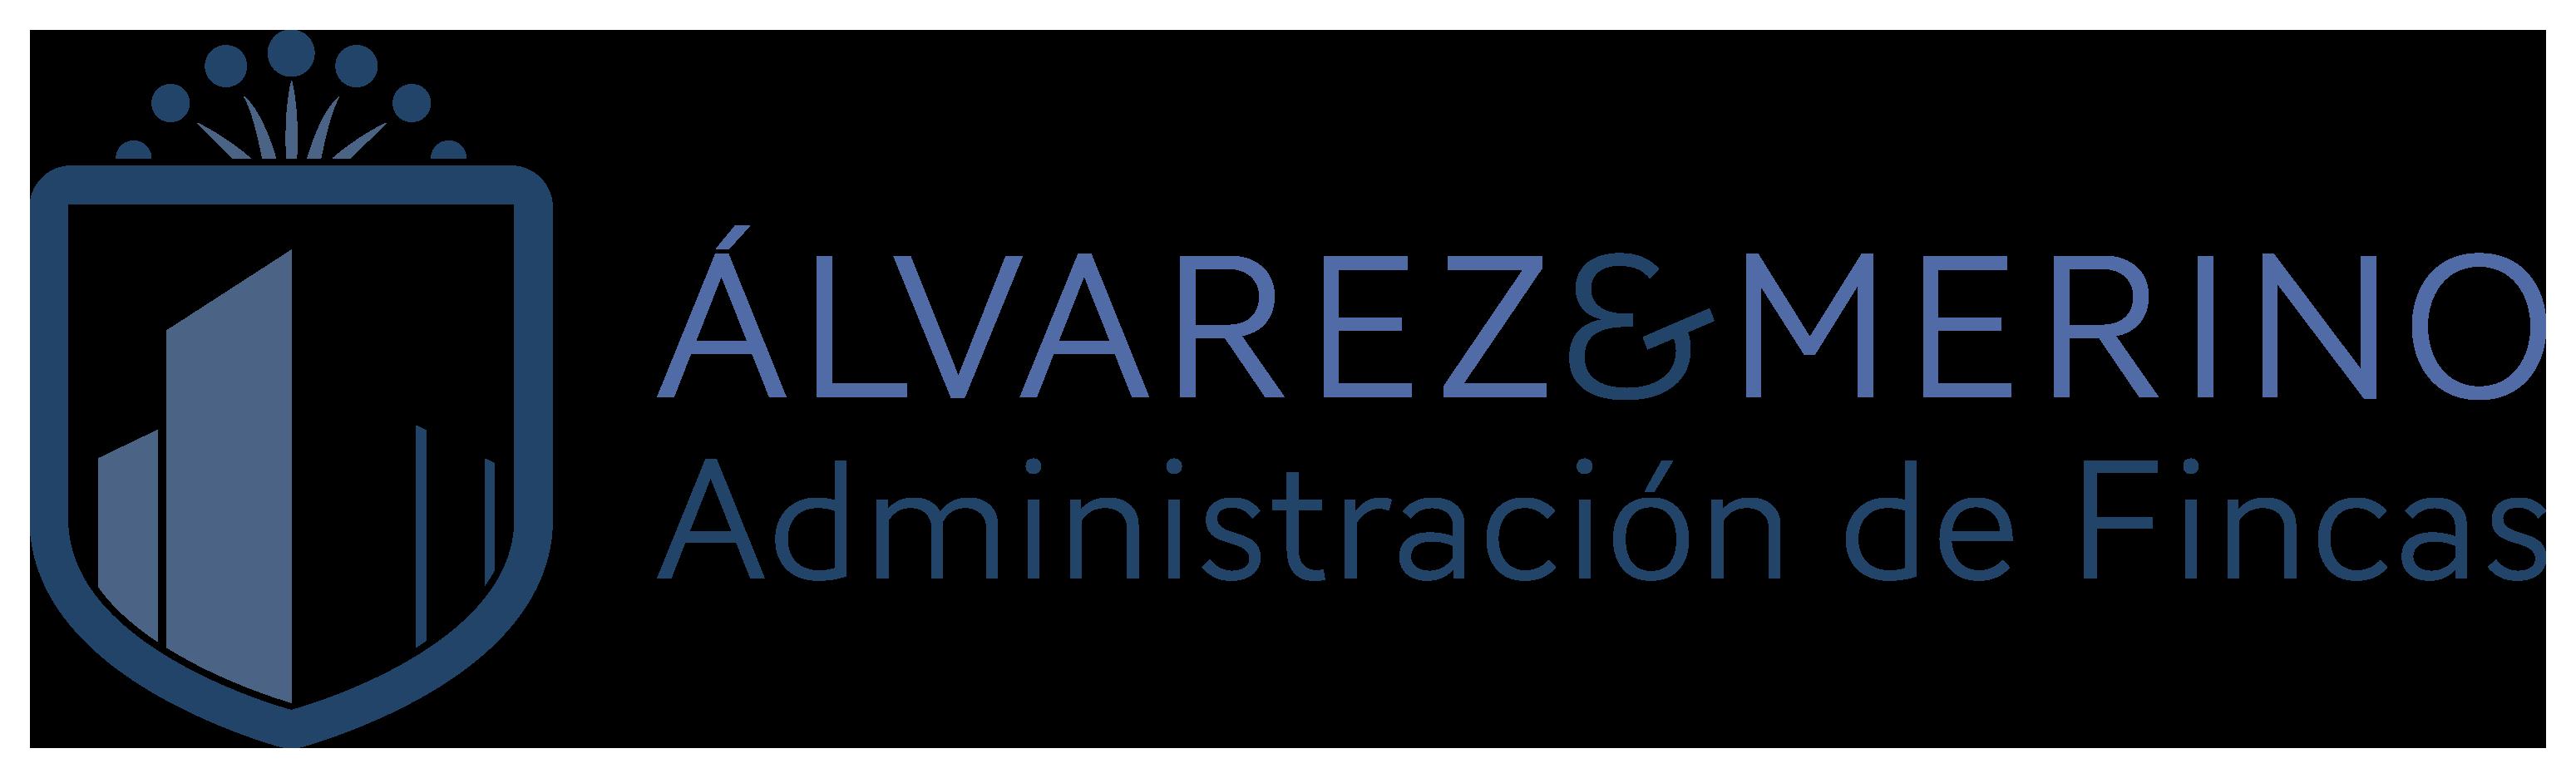 Logo Fincas Álvarez & Merino footer